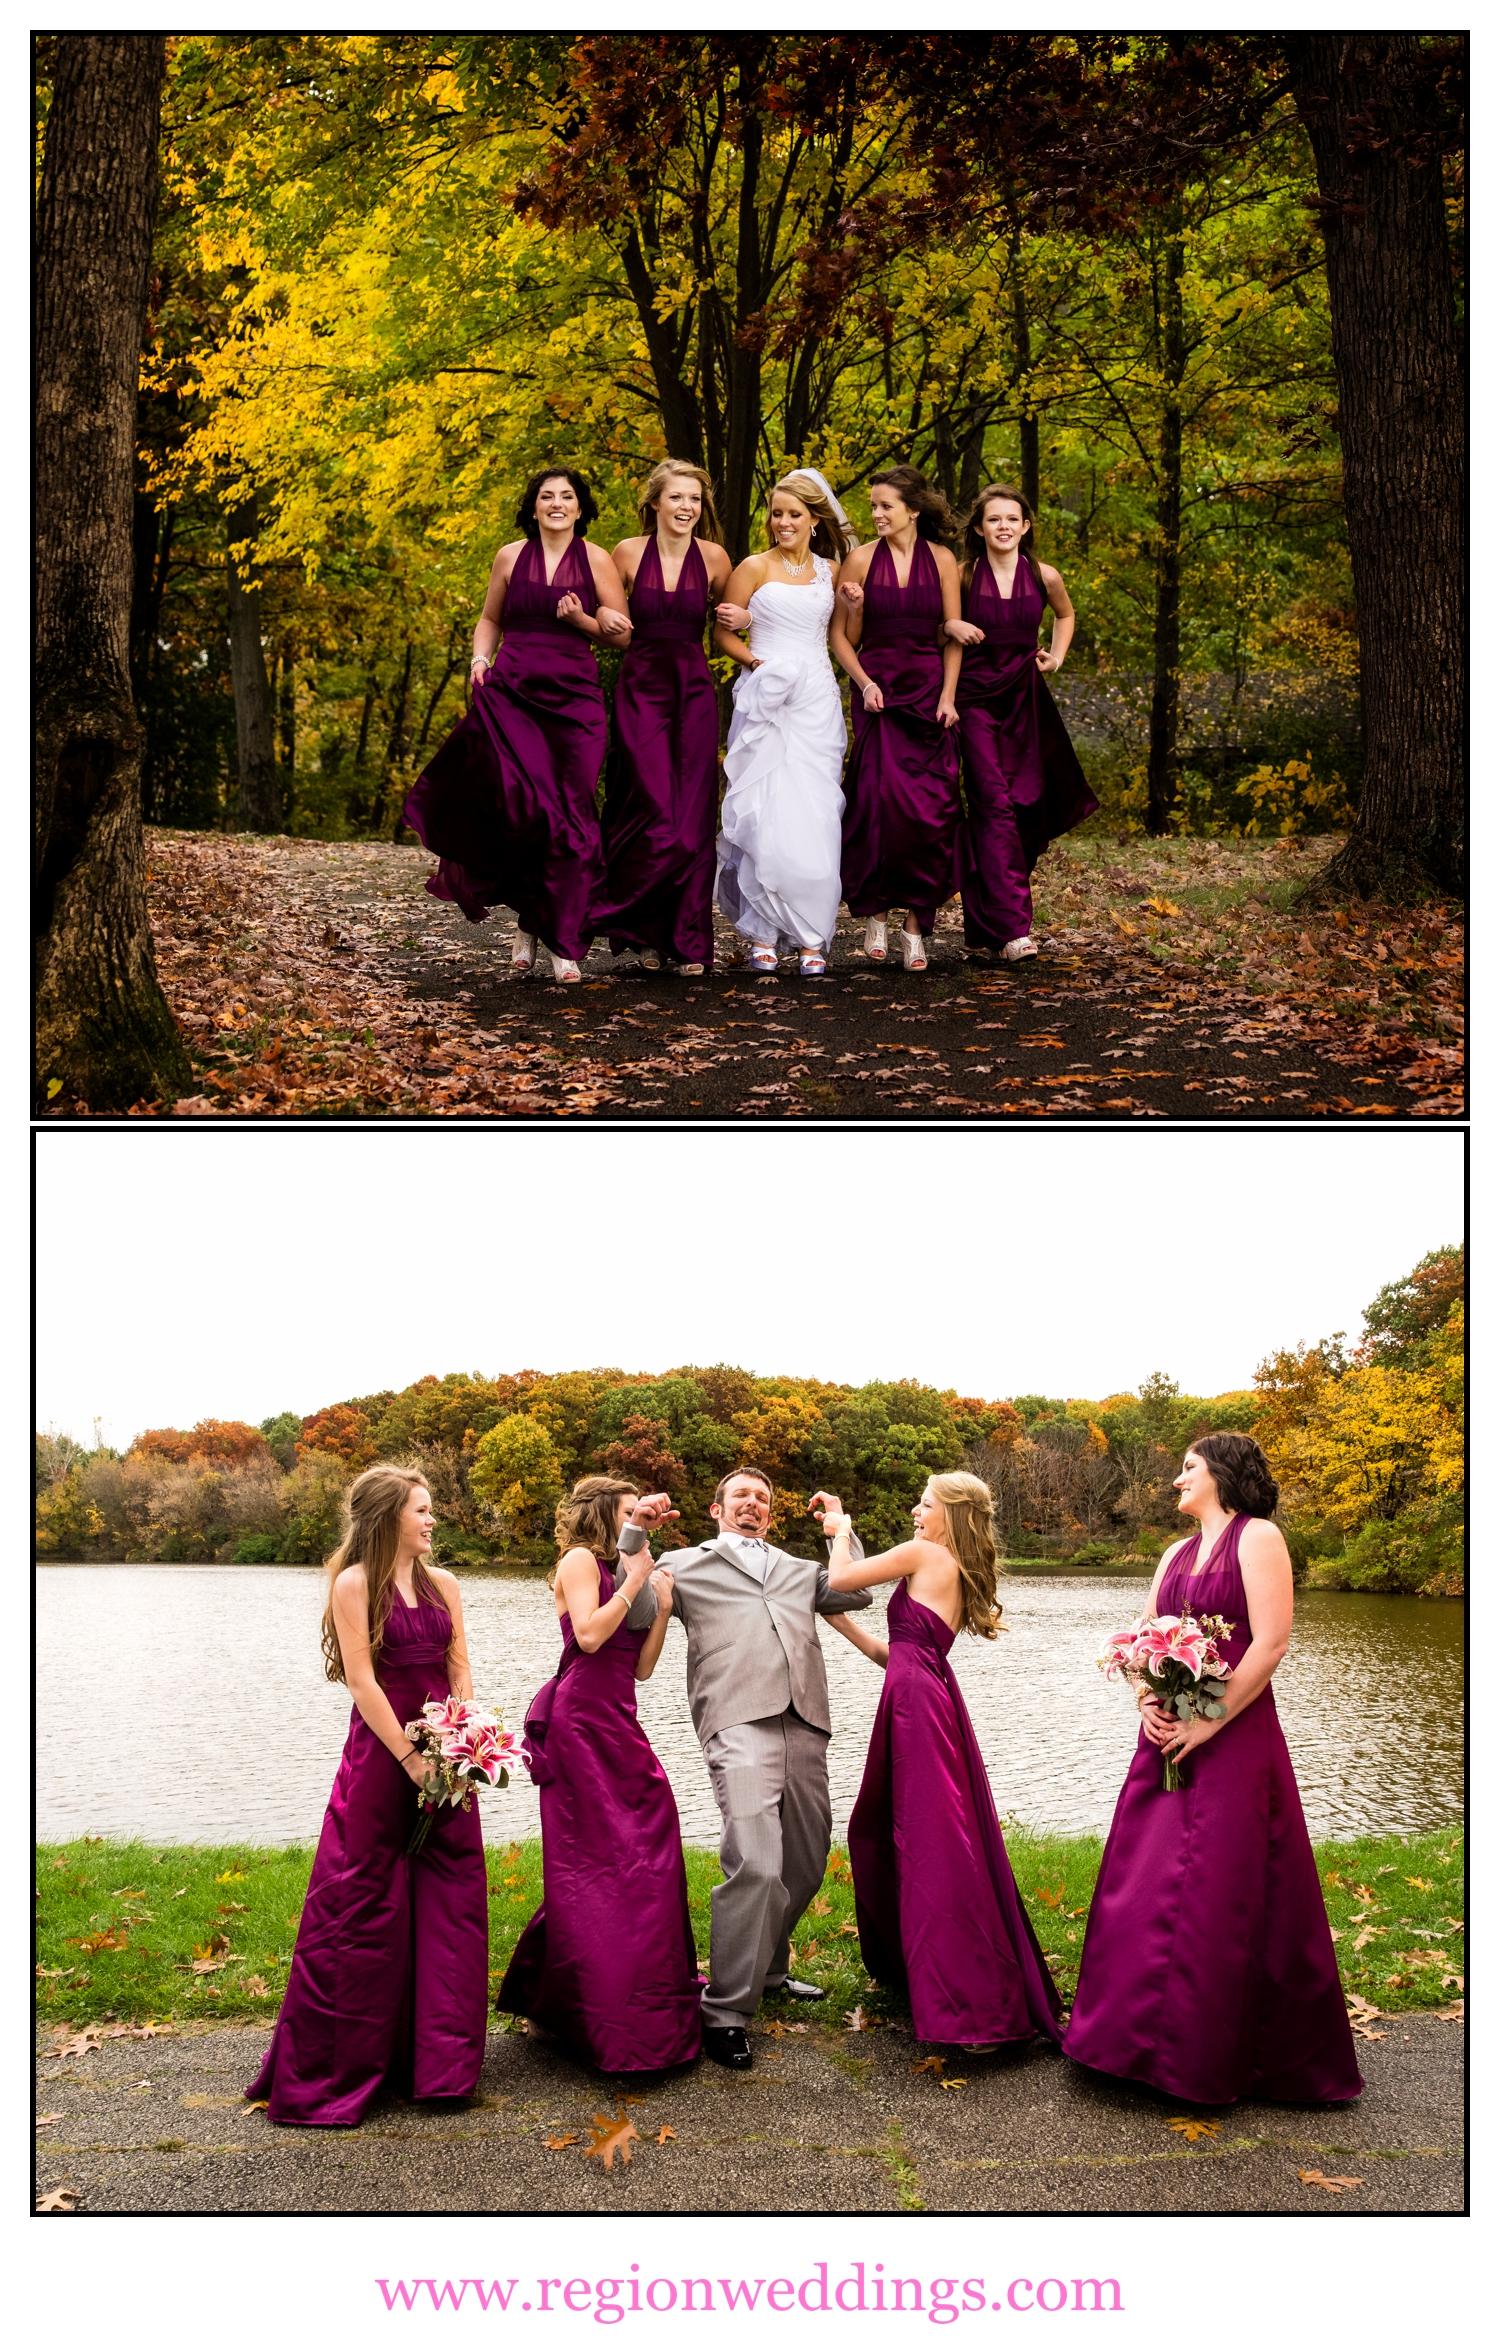 Fun, Fall wedding photos at Lemon Lake Park.